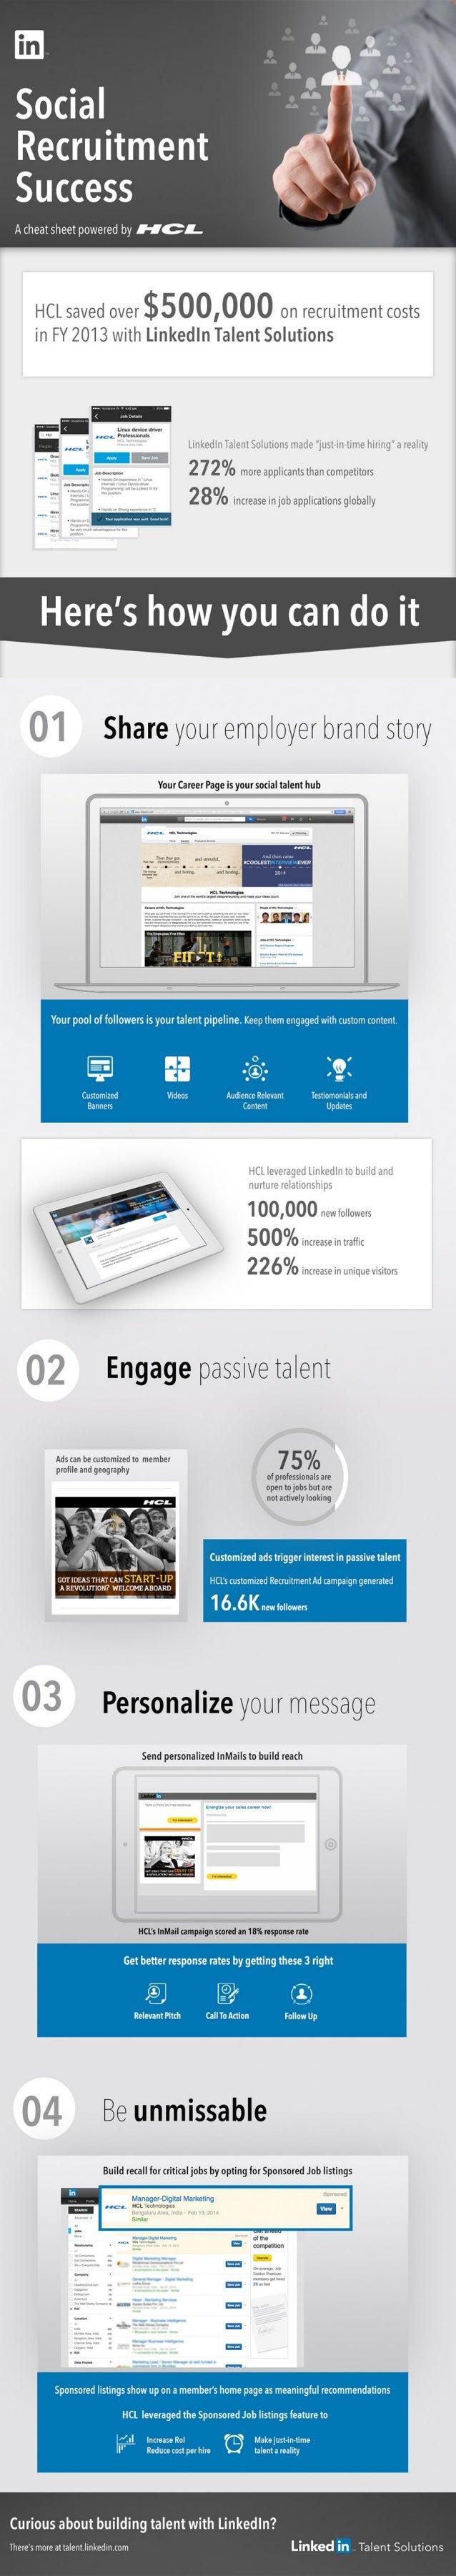 LinkedIn Social Recruitment Cheat Sheet Powered by HCL | Infographic